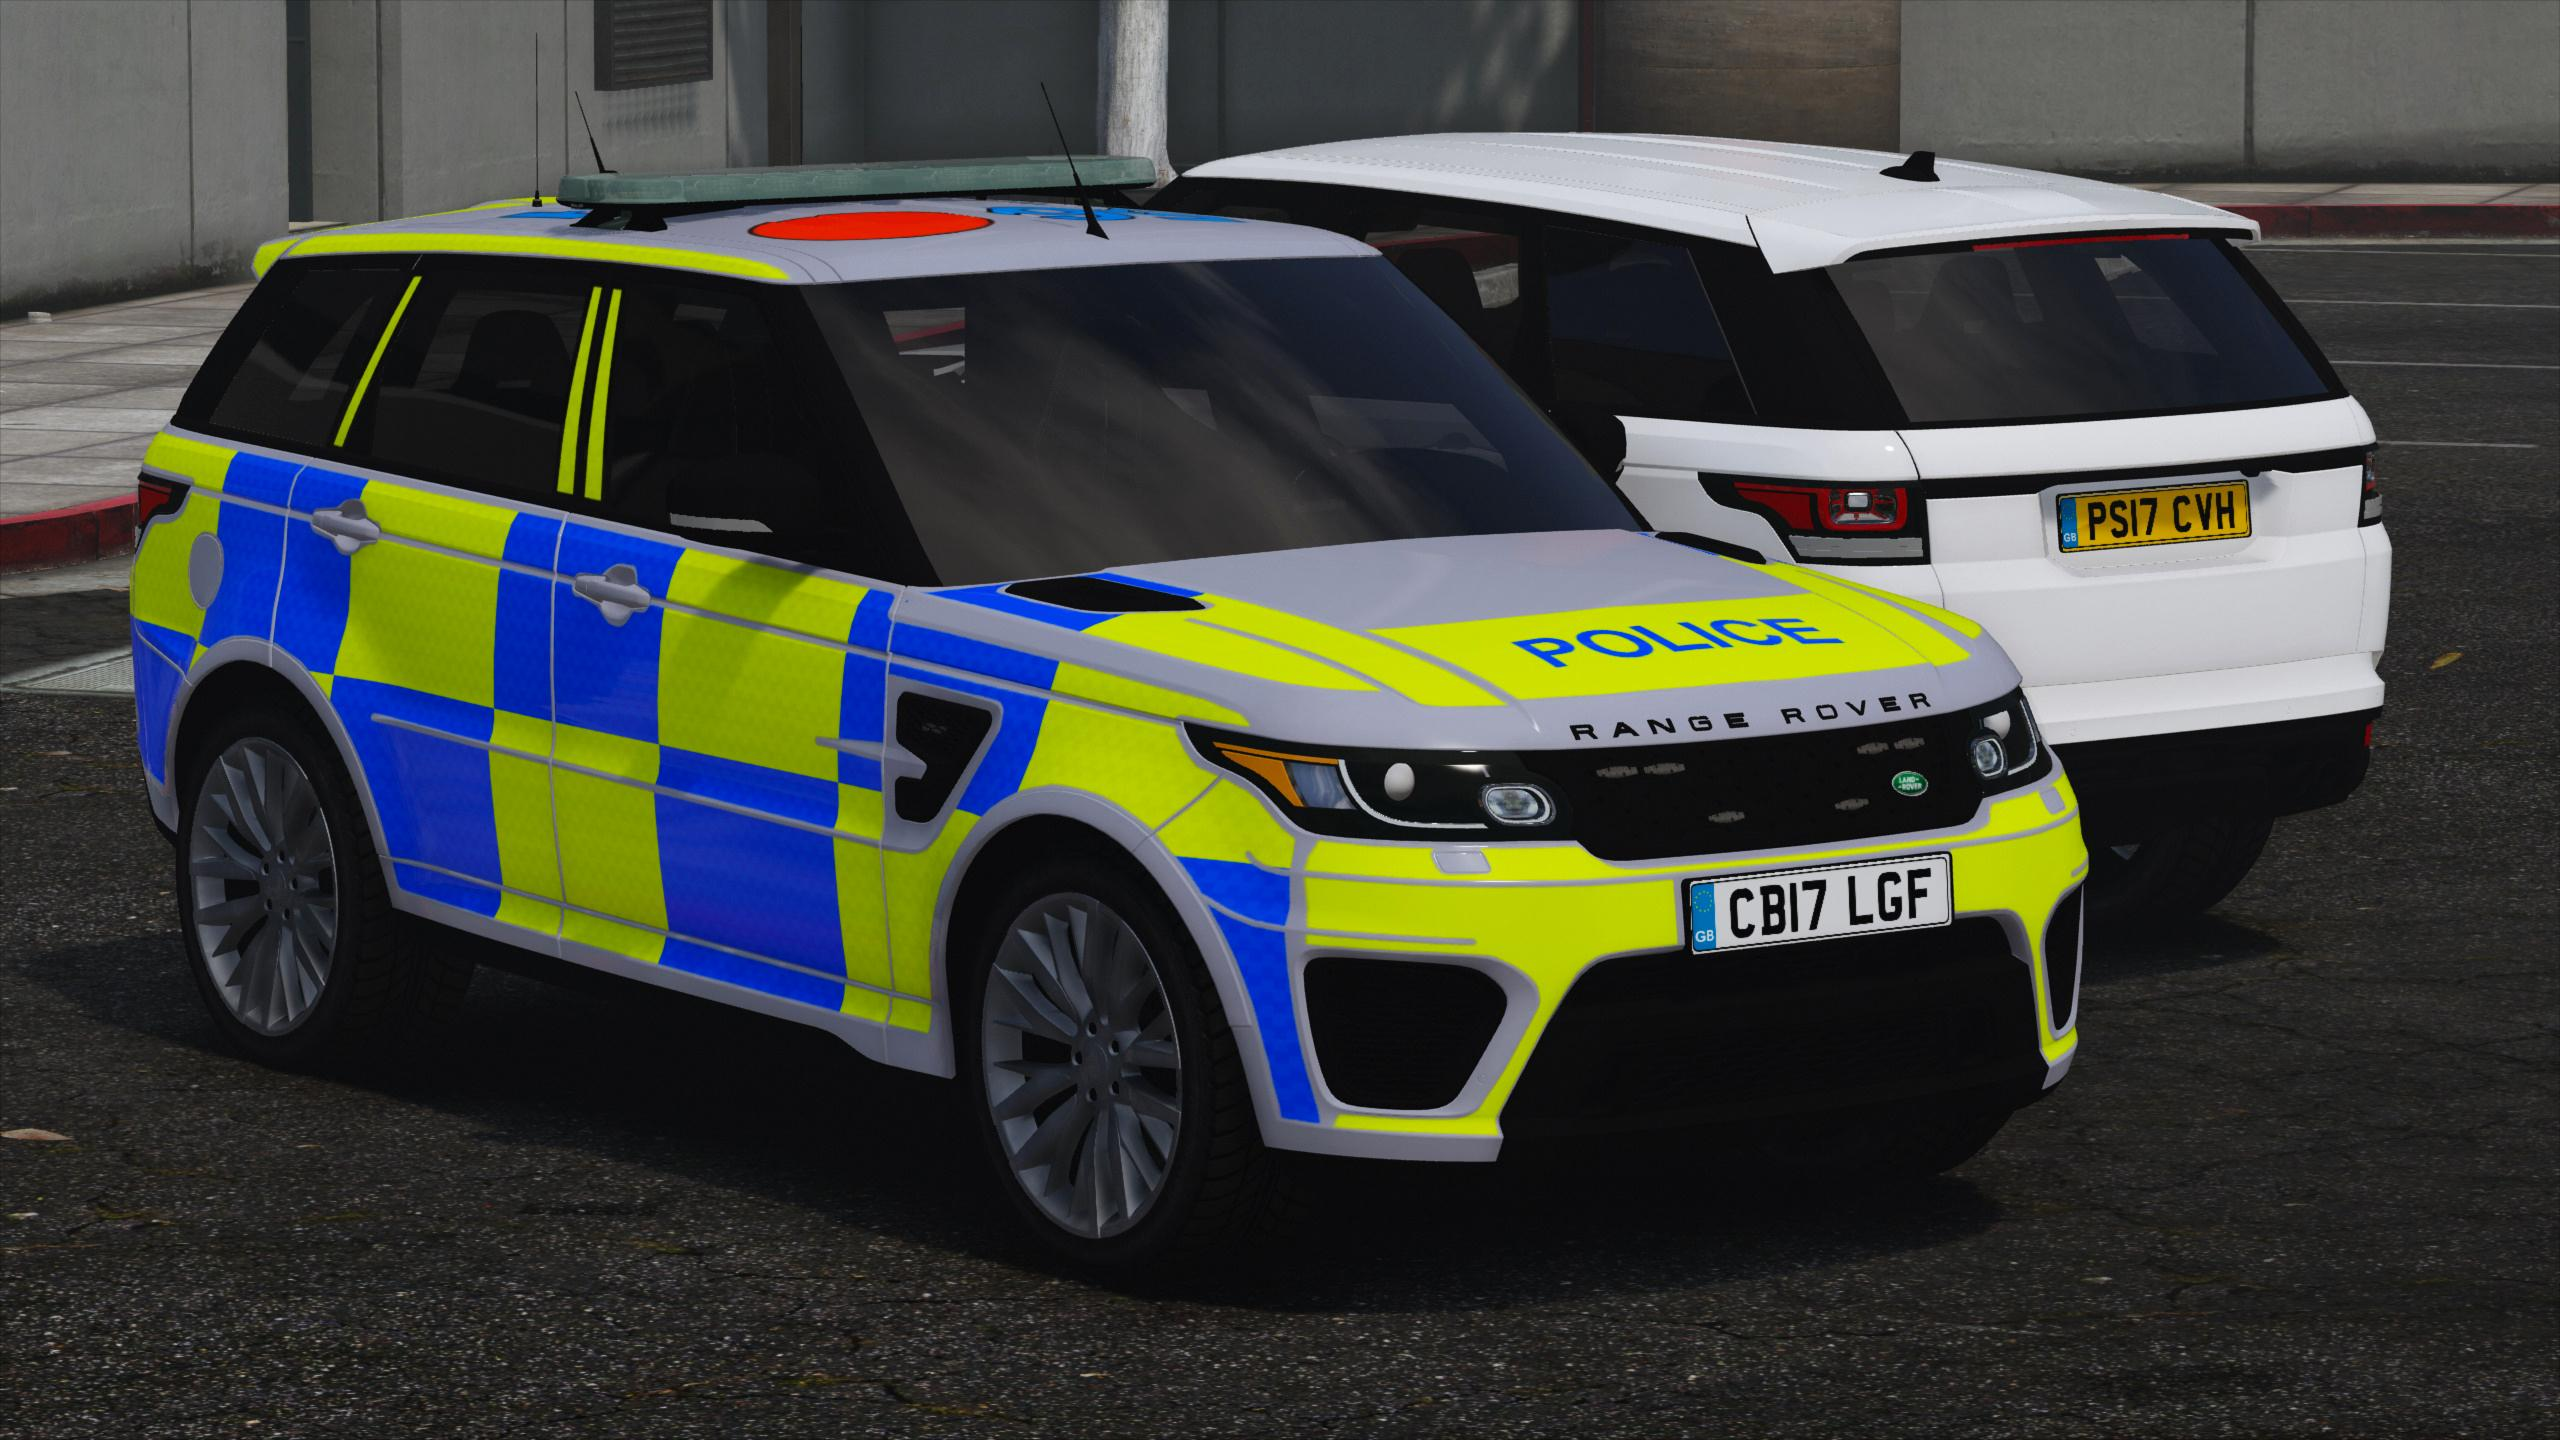 2017 Police Range Rover Svr Gta5 Mods Com